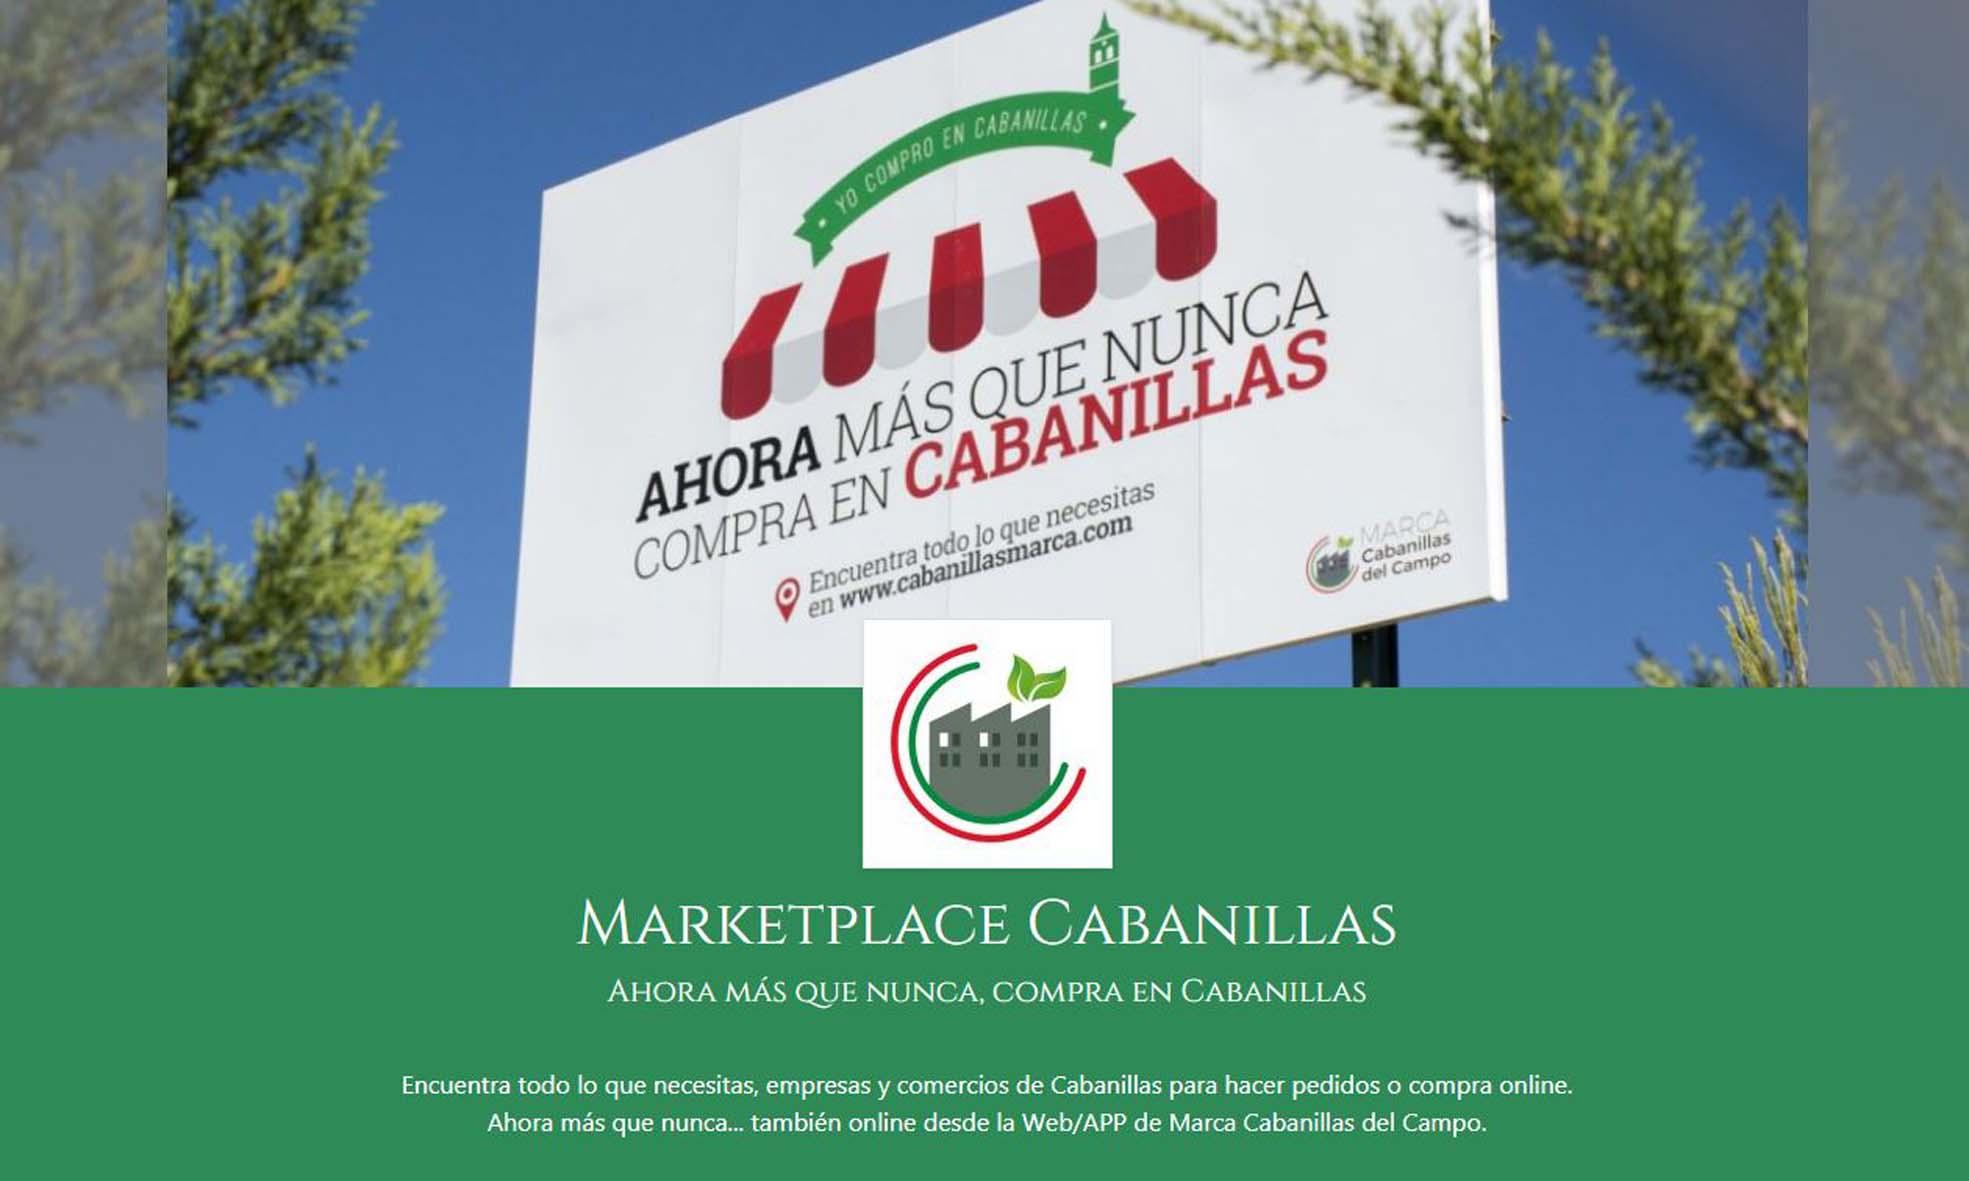 MarketPlace Cabanillas